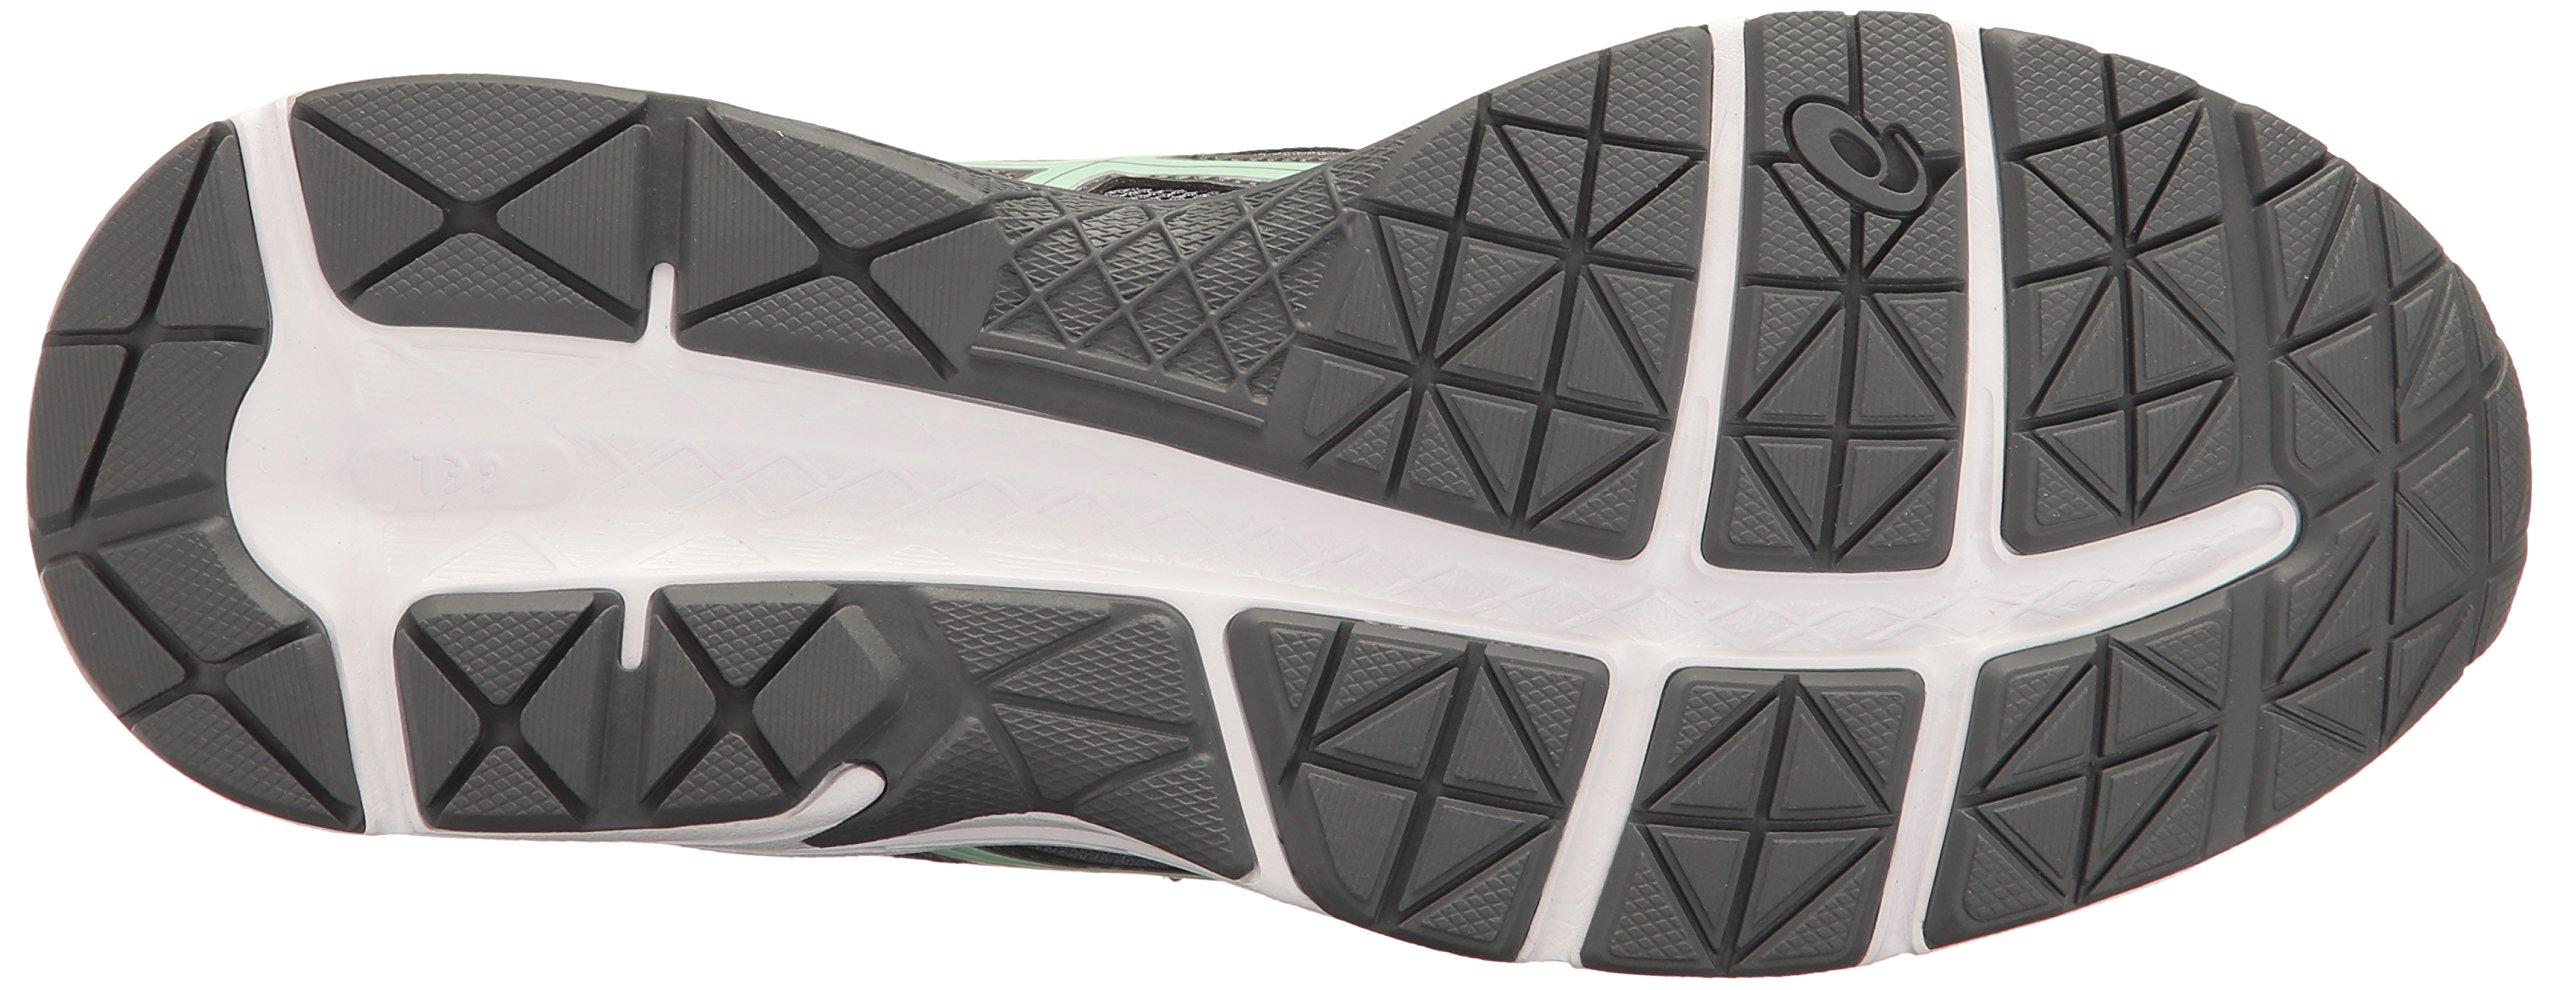 ASICS Womens Gel-Contend 4 Running Shoe, Mid Grey/Glacier Sea/Silver, 5 Medium US by ASICS (Image #3)